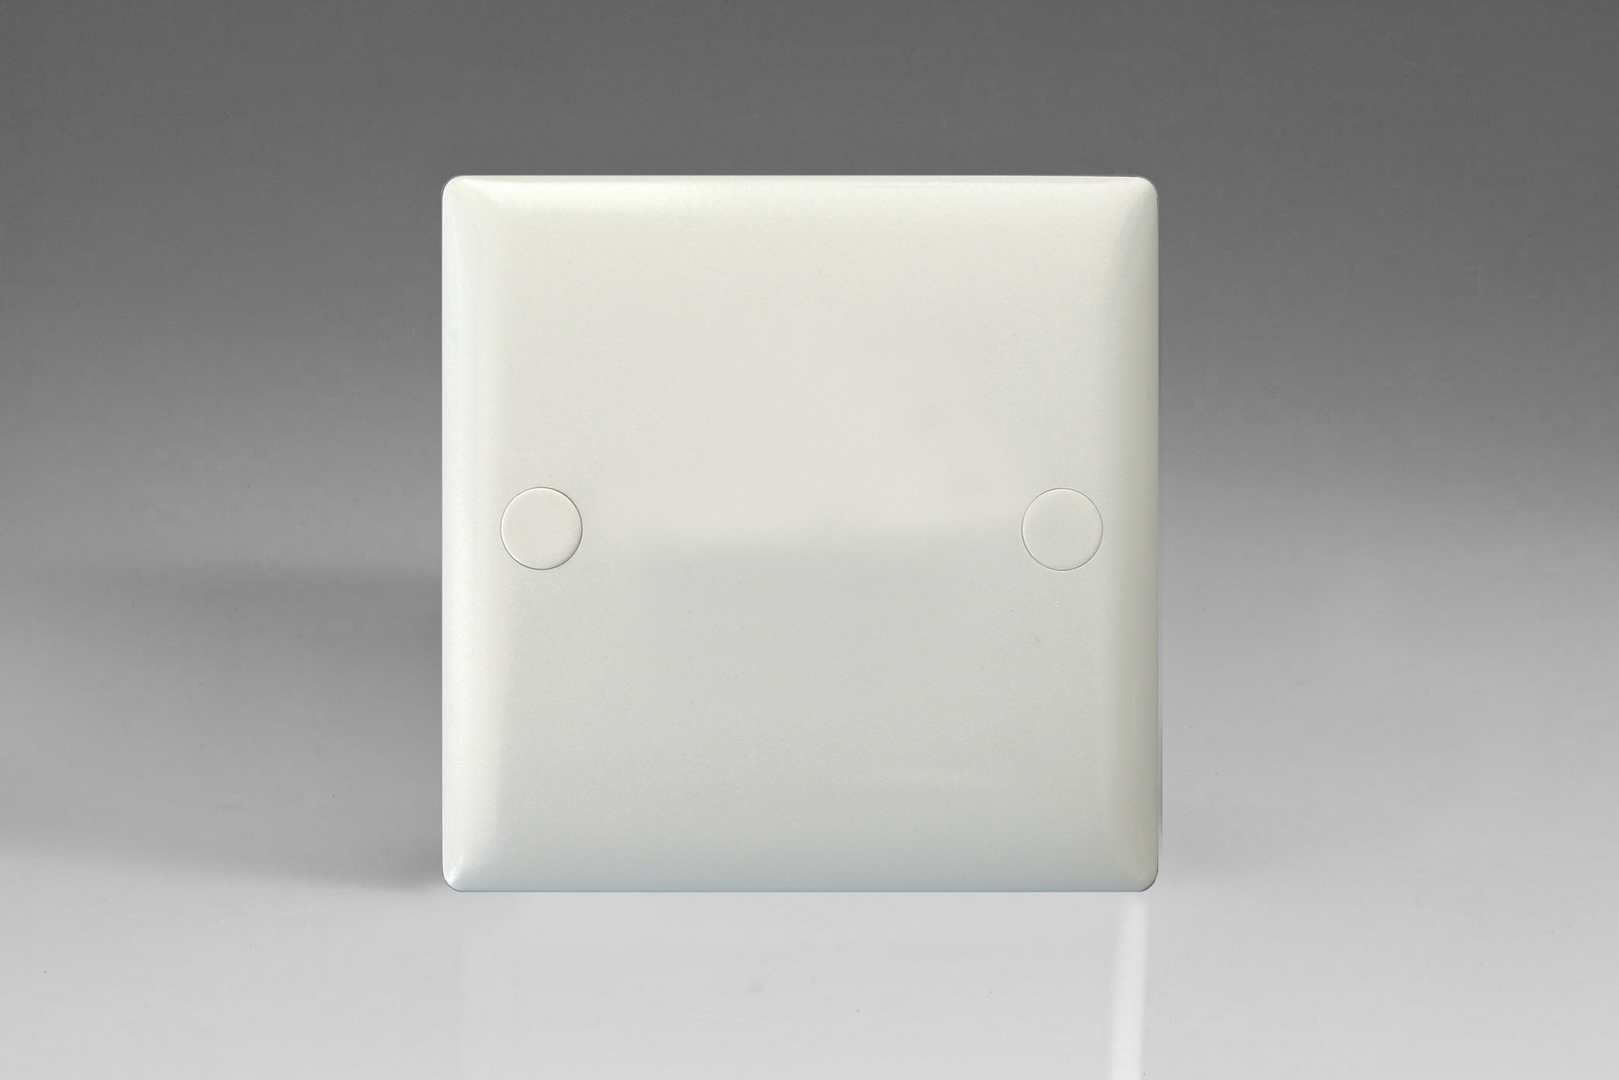 Varilight XO1W Value Polar White 1 Gang 10A 1 or 2 Way Rocker Light Switch